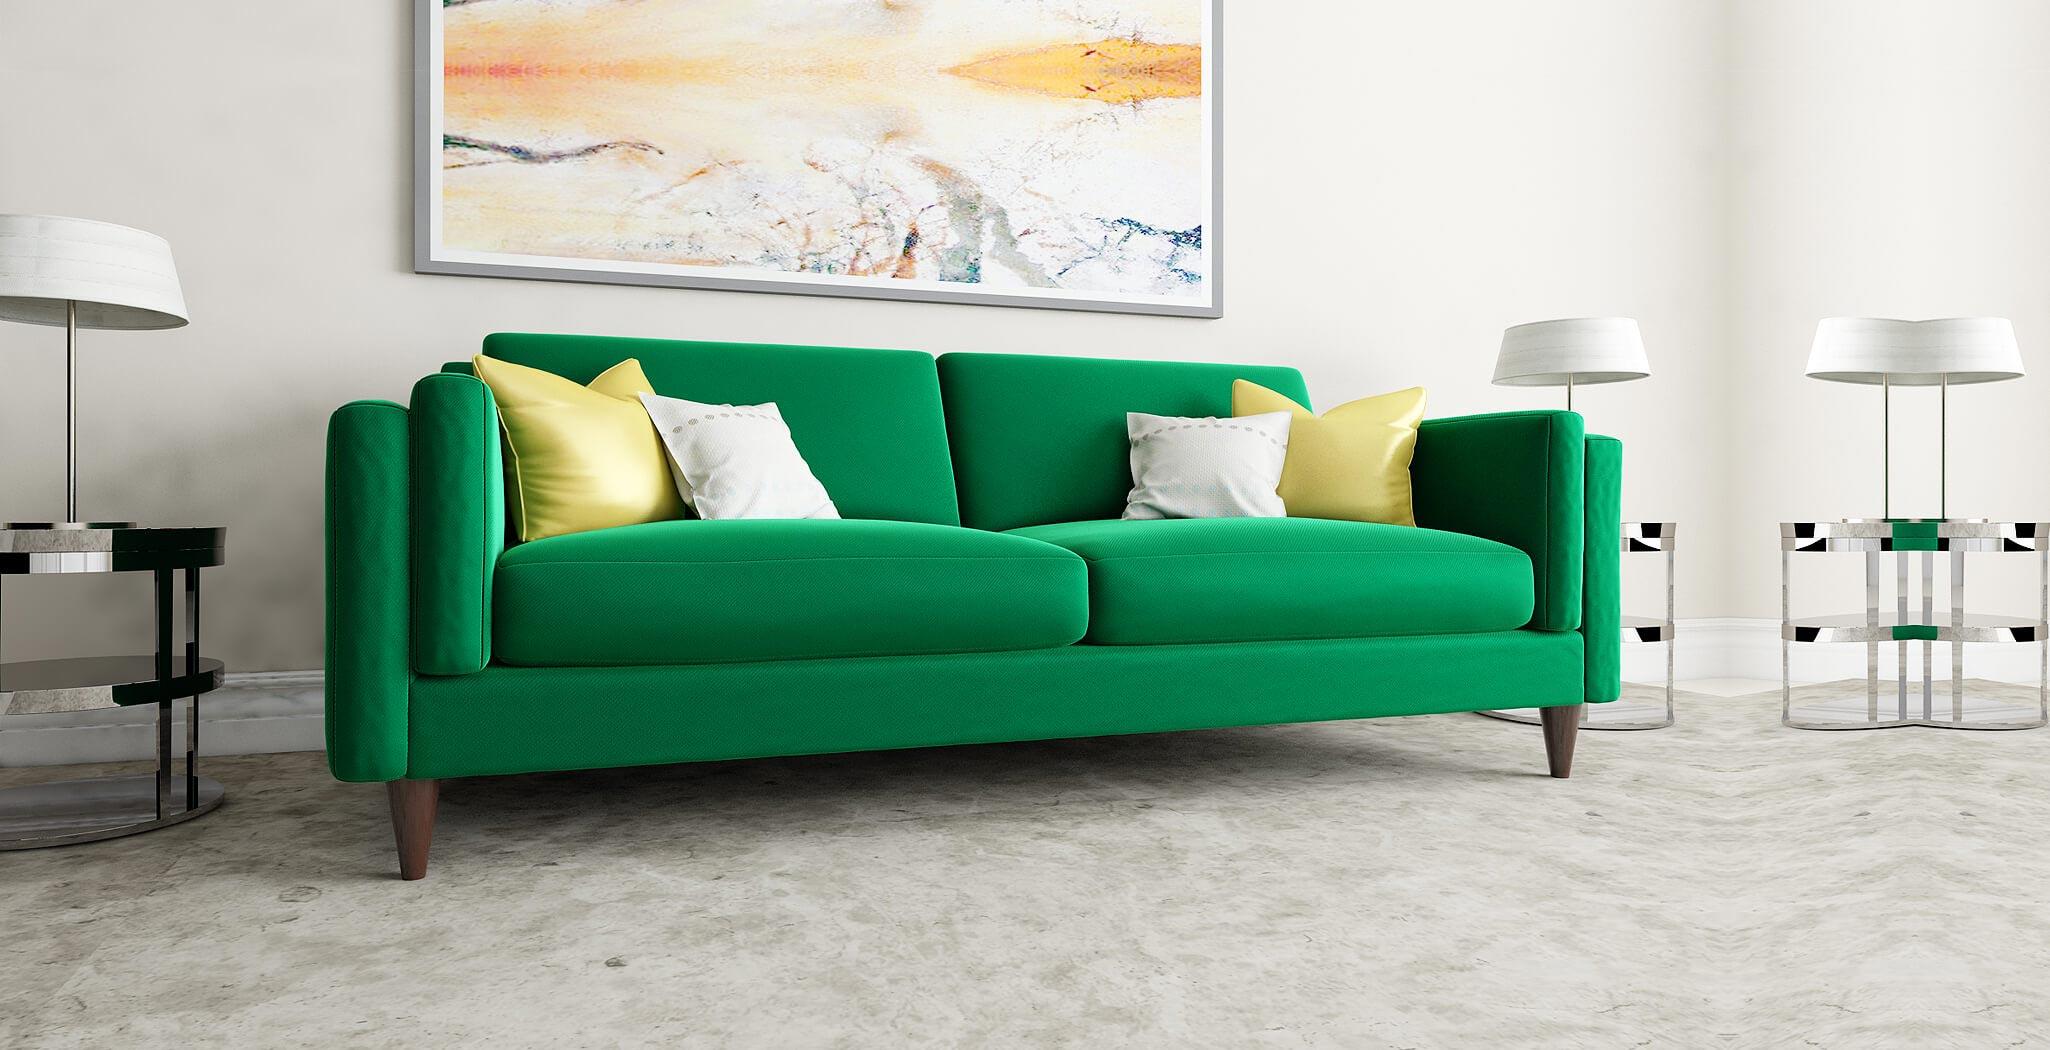 helsinki sofa furniture gallery 5